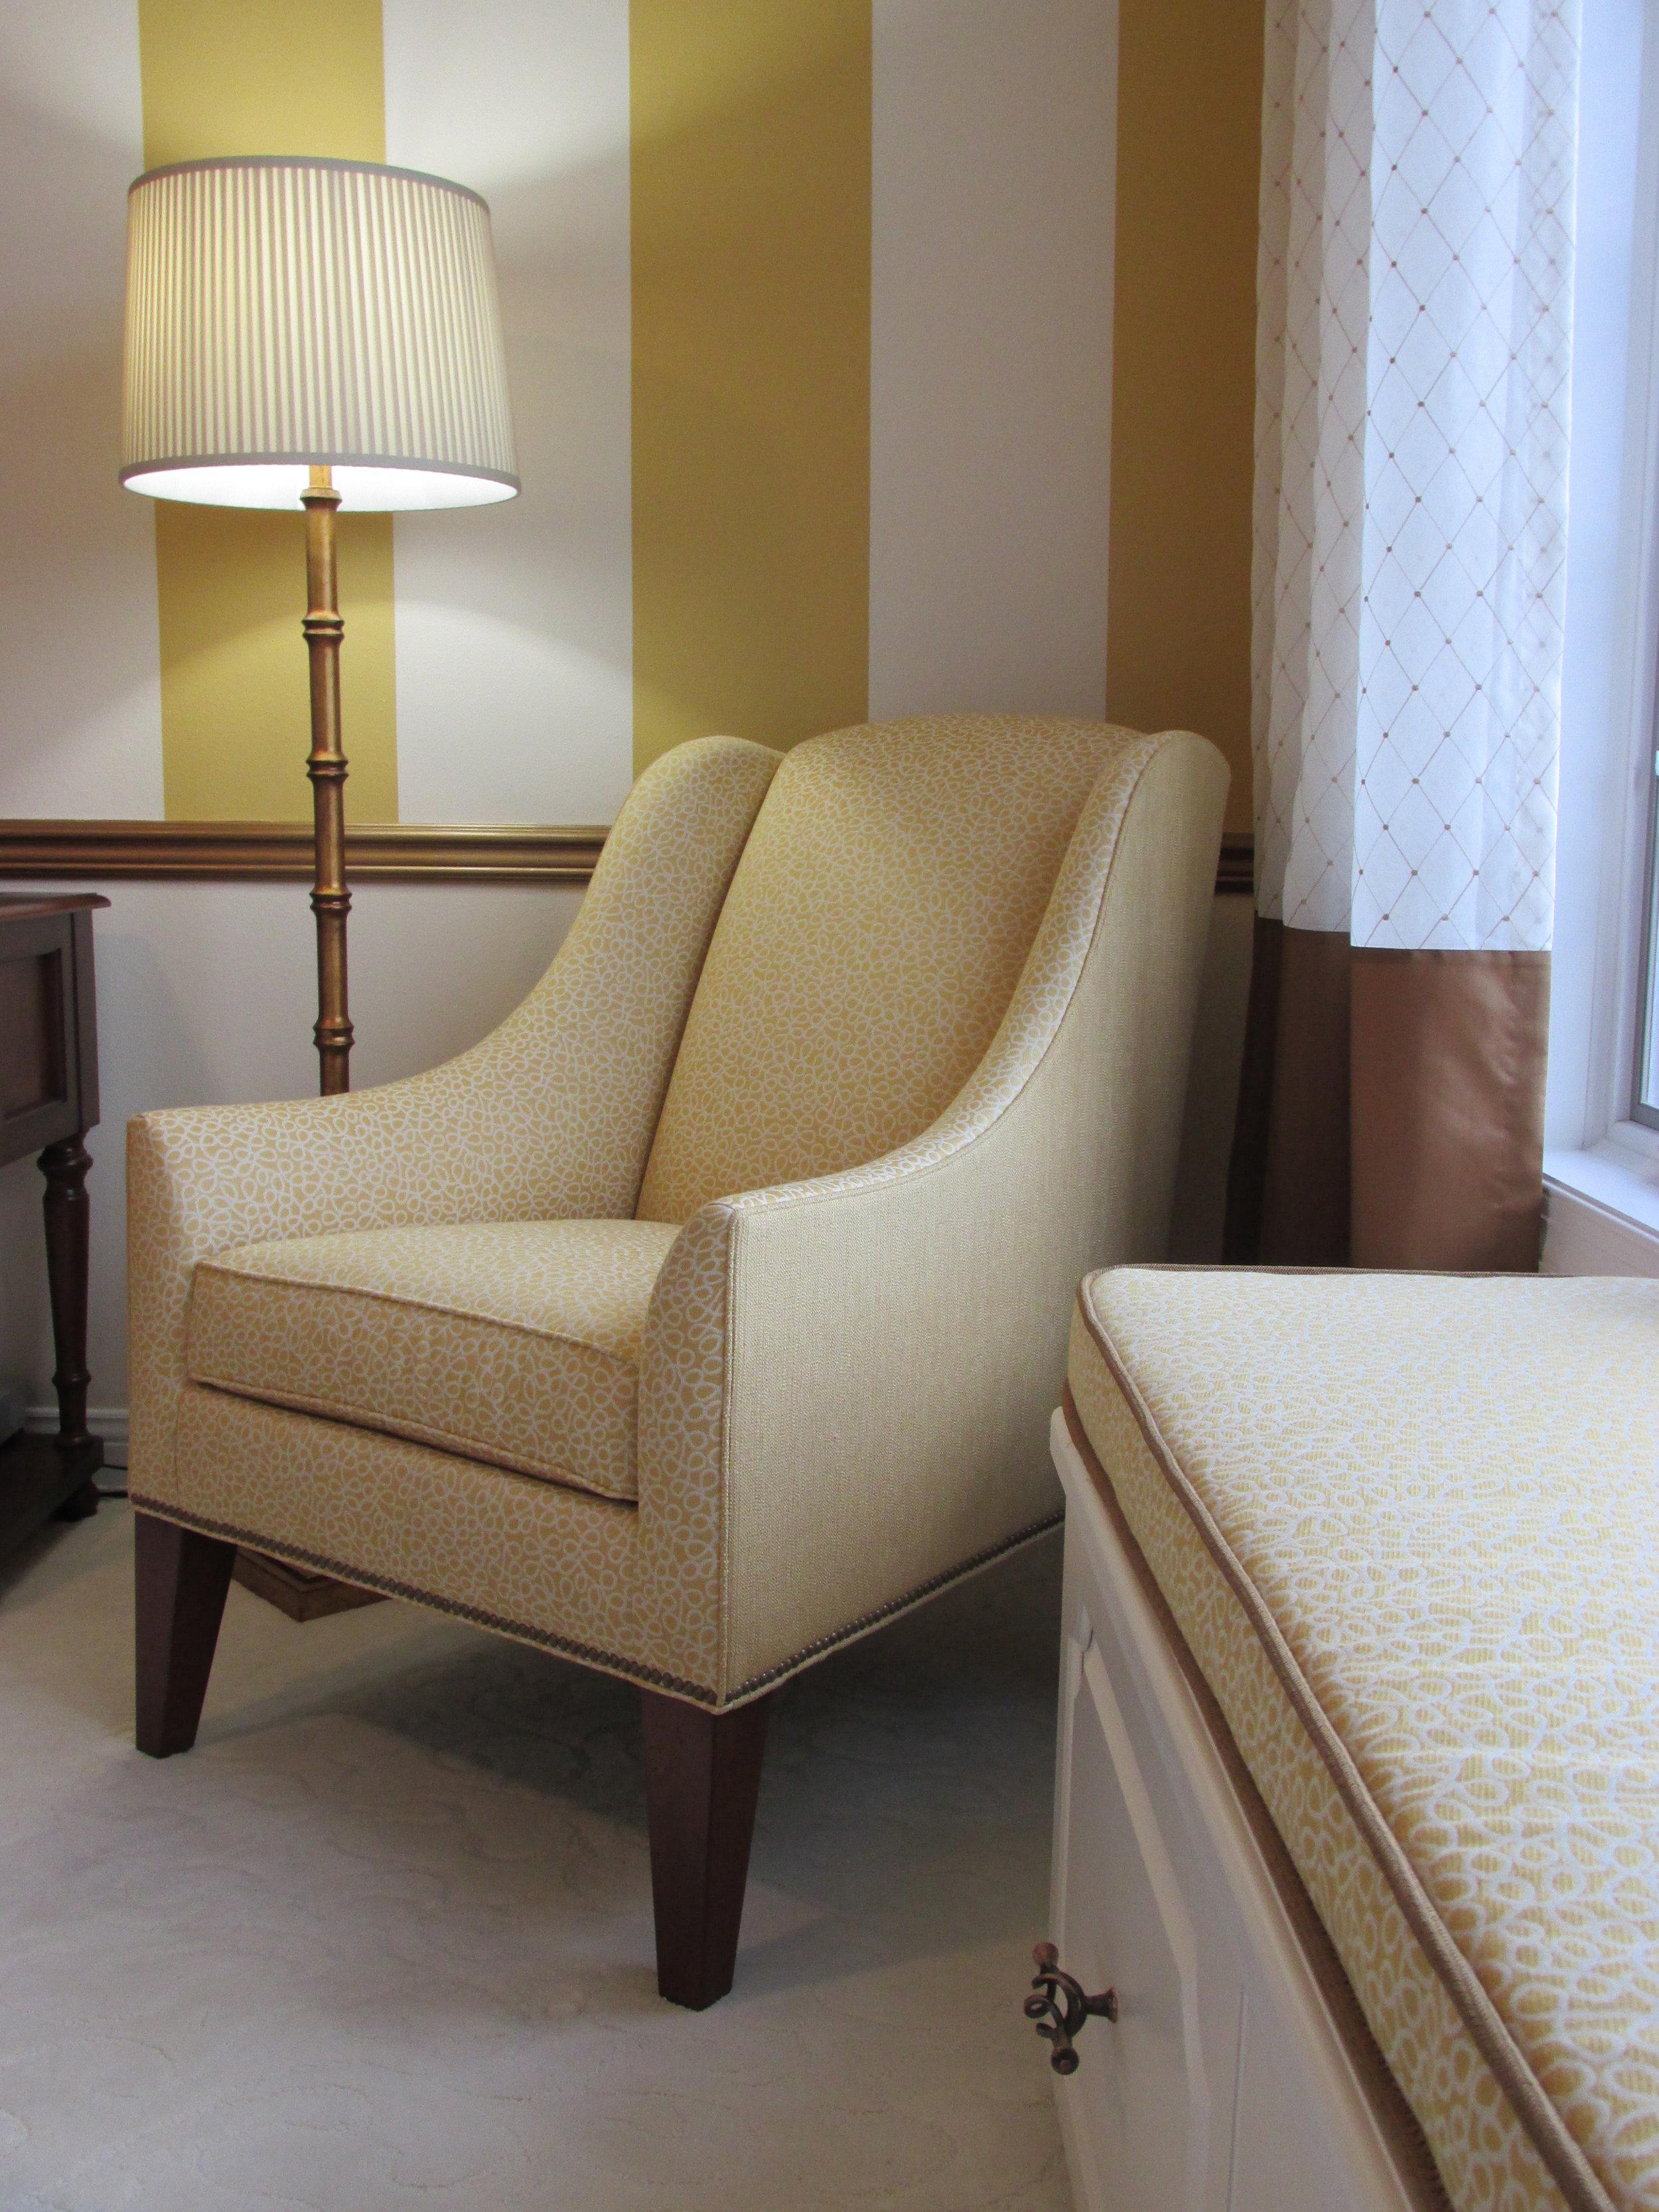 Transitional Tuscan - Chair.JPG